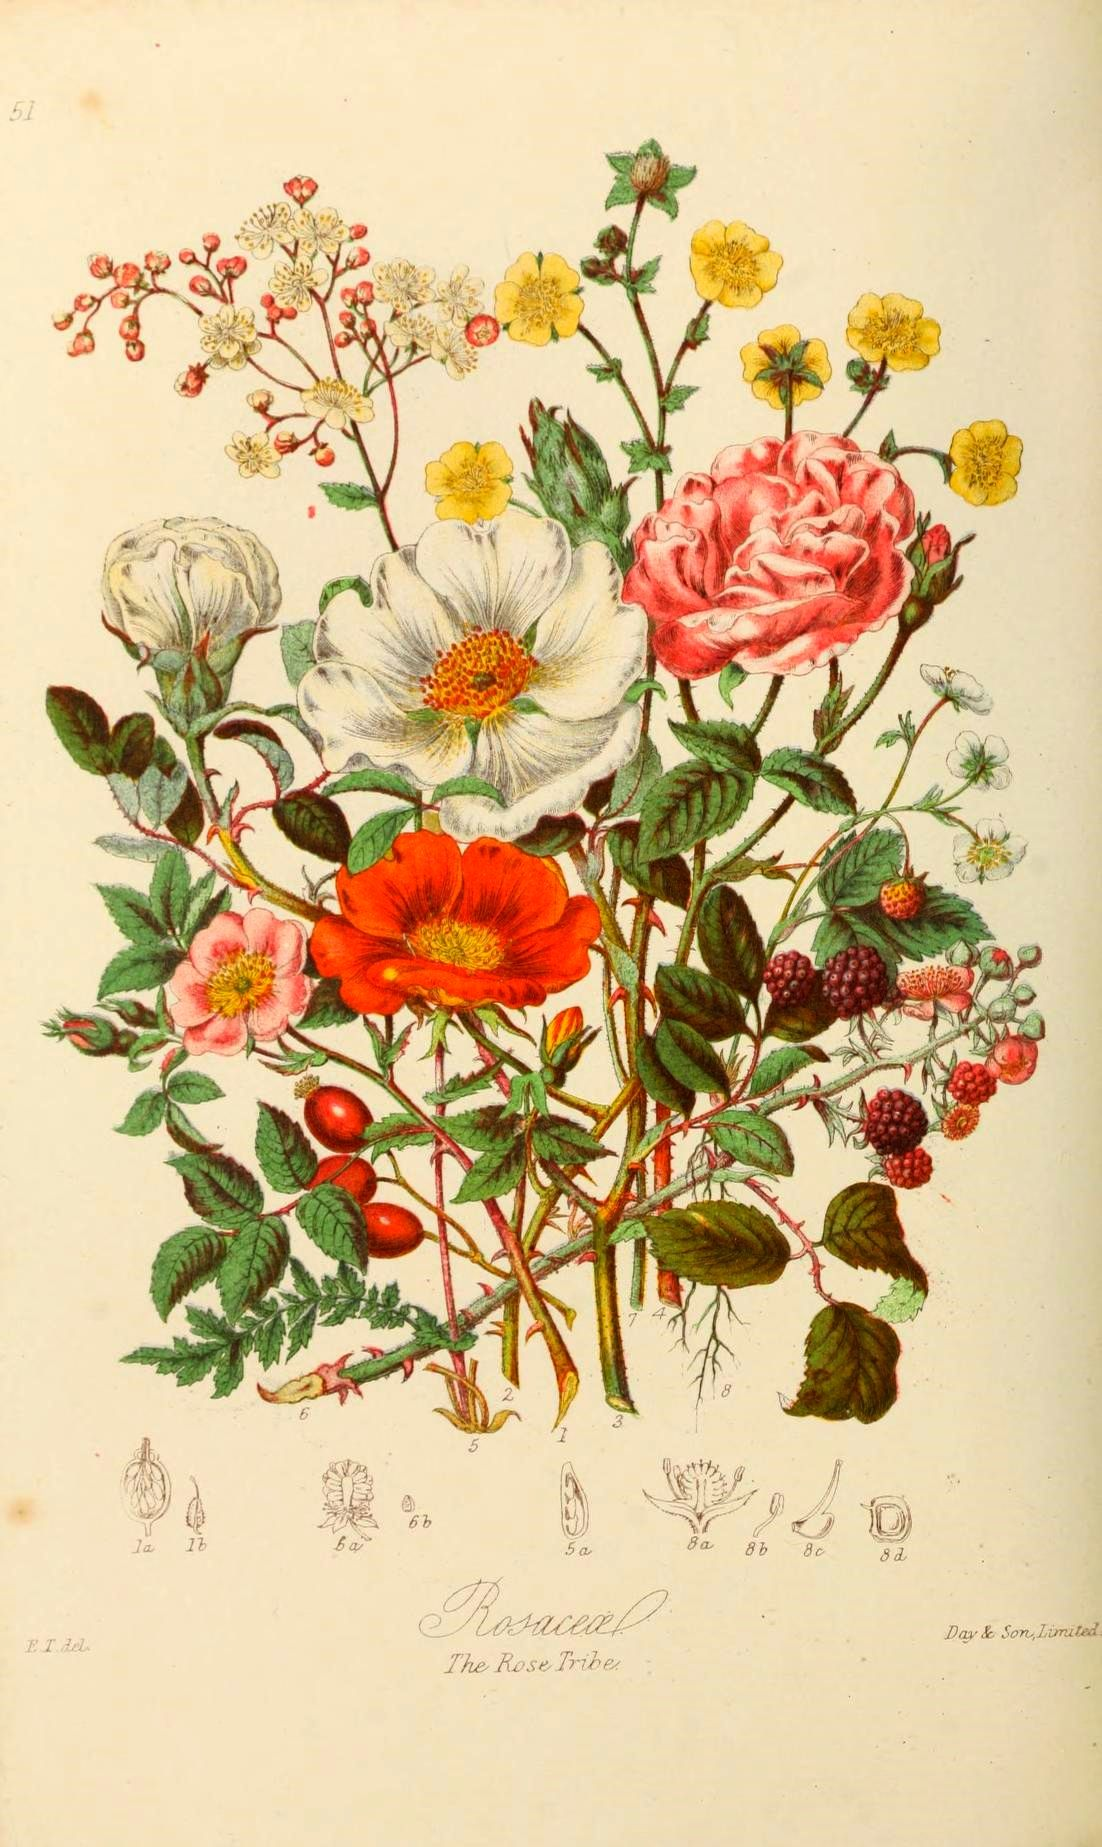 Scientificillustration Botanical Illustration Vintage Botanical Drawings Vintage Botanical Prints